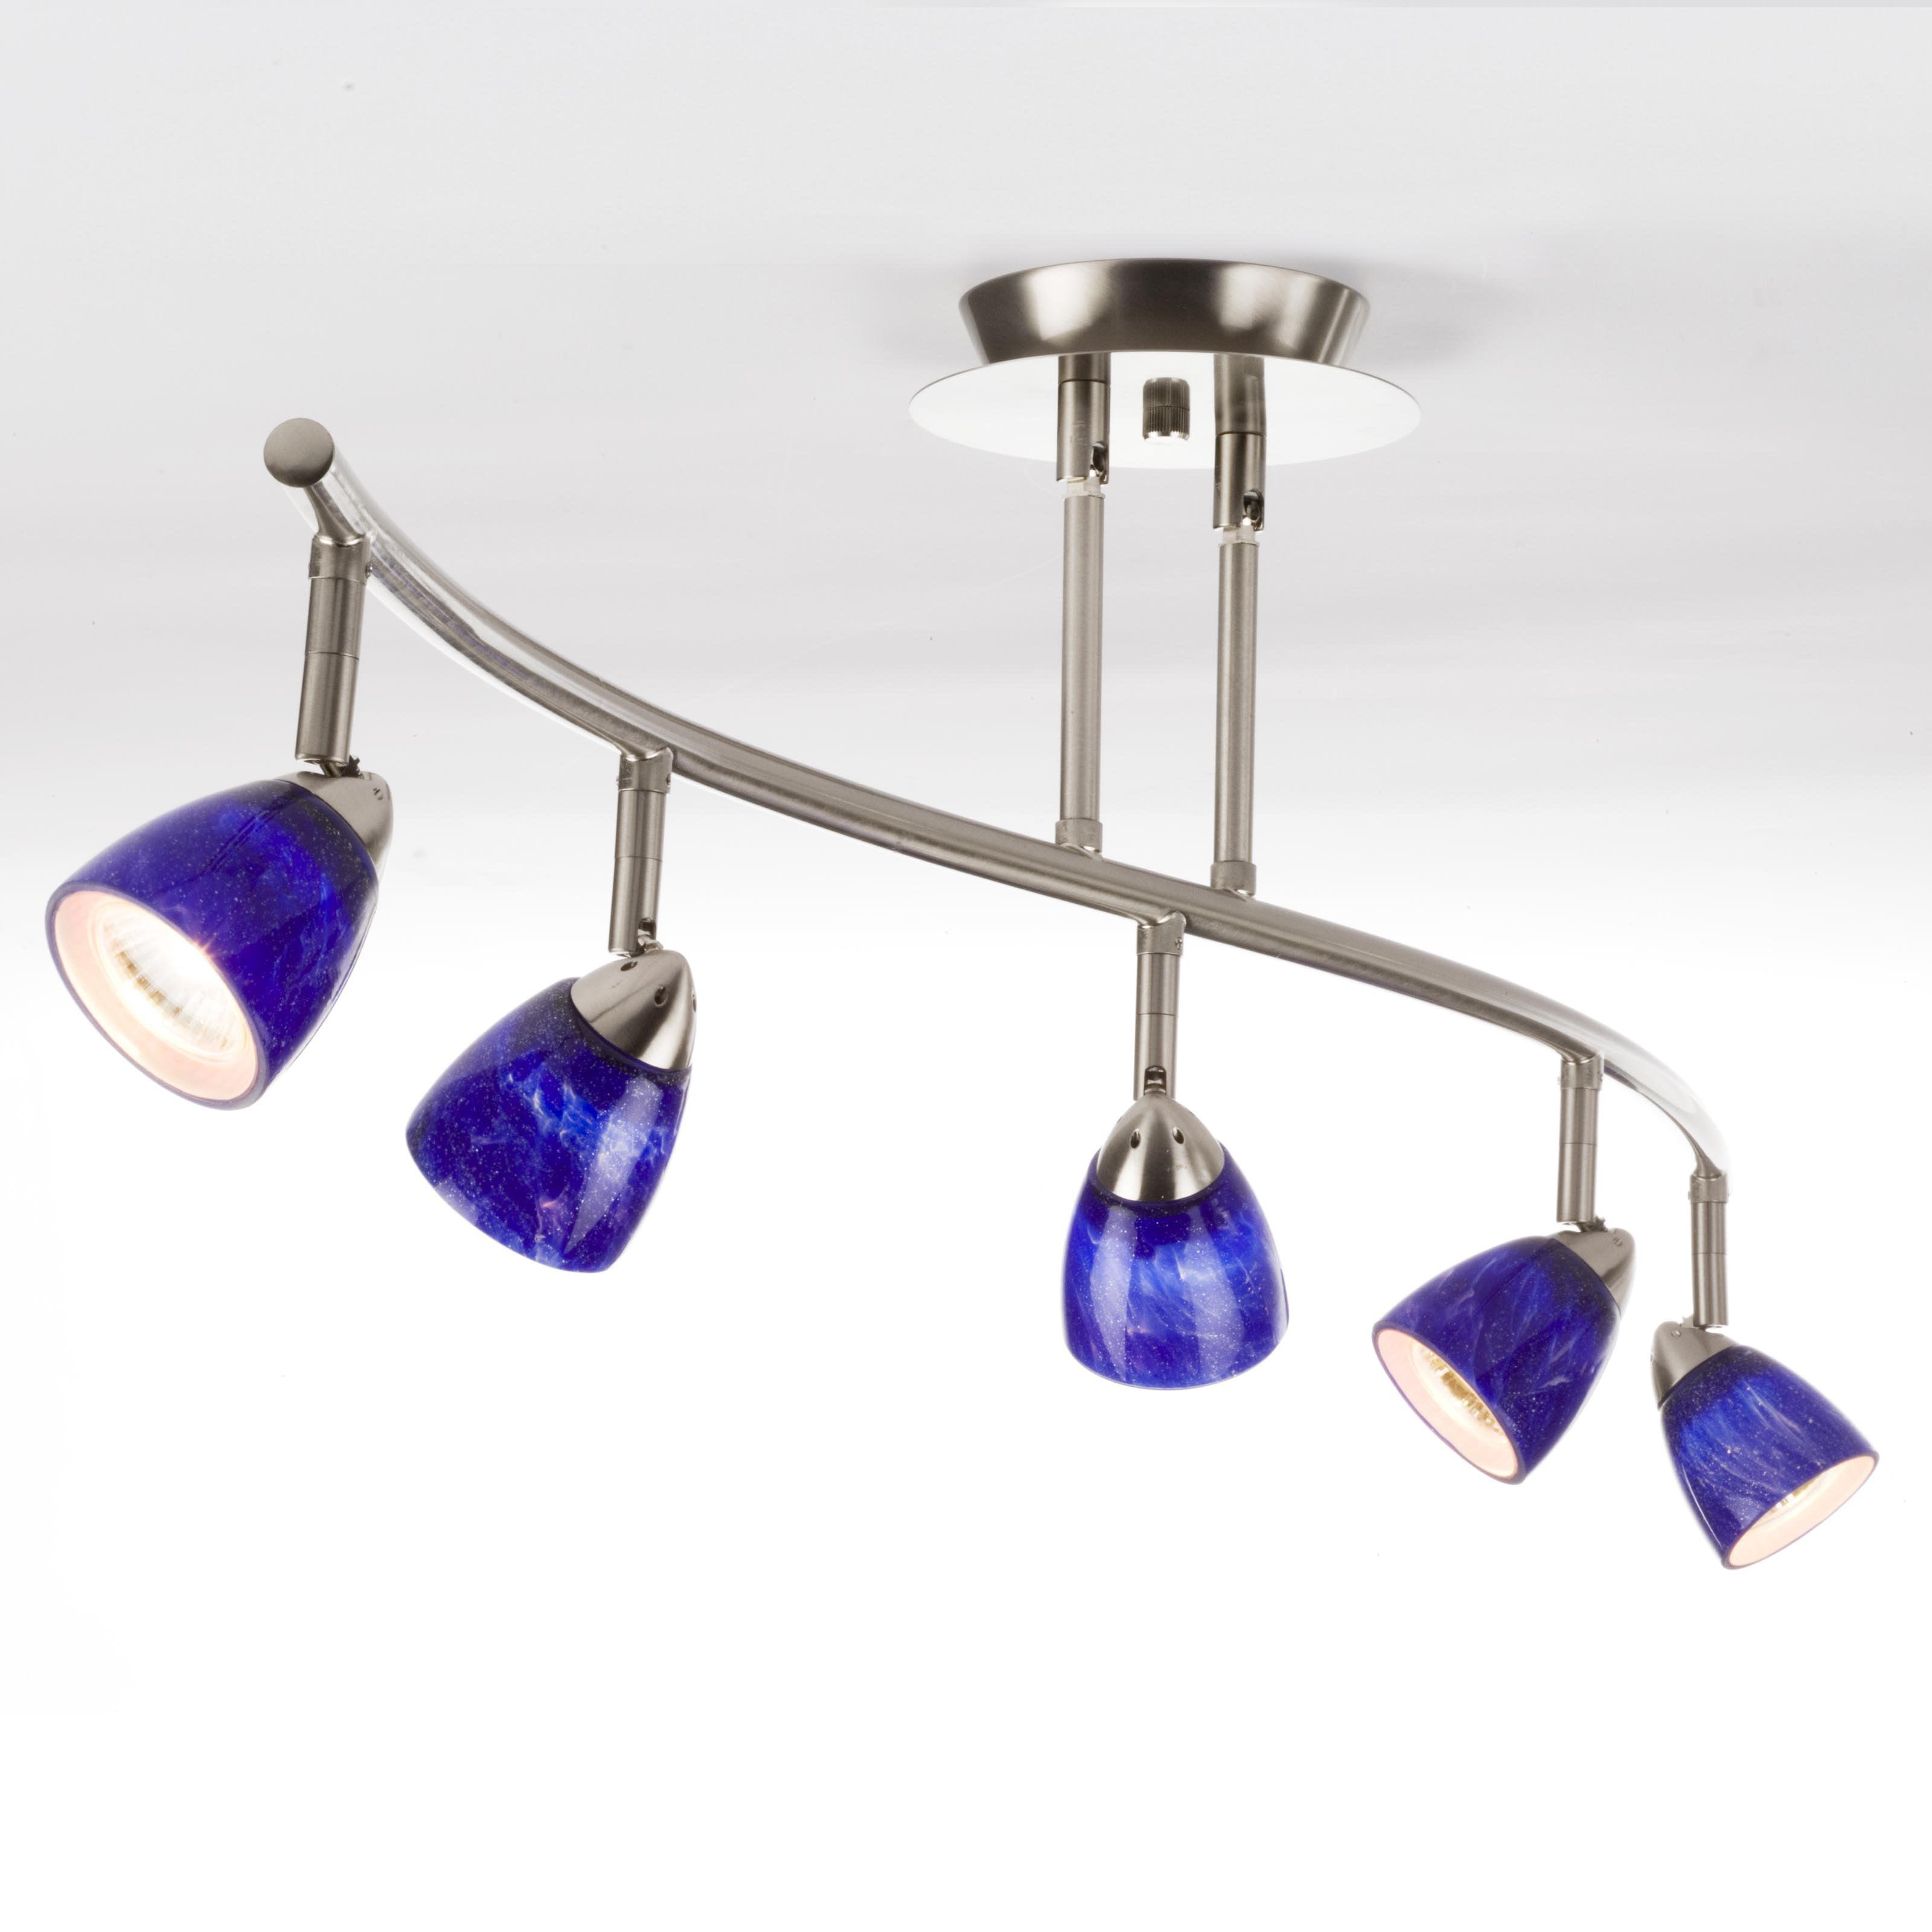 Cal Lighting Serpentine Rail Light Bar - 5 Heads